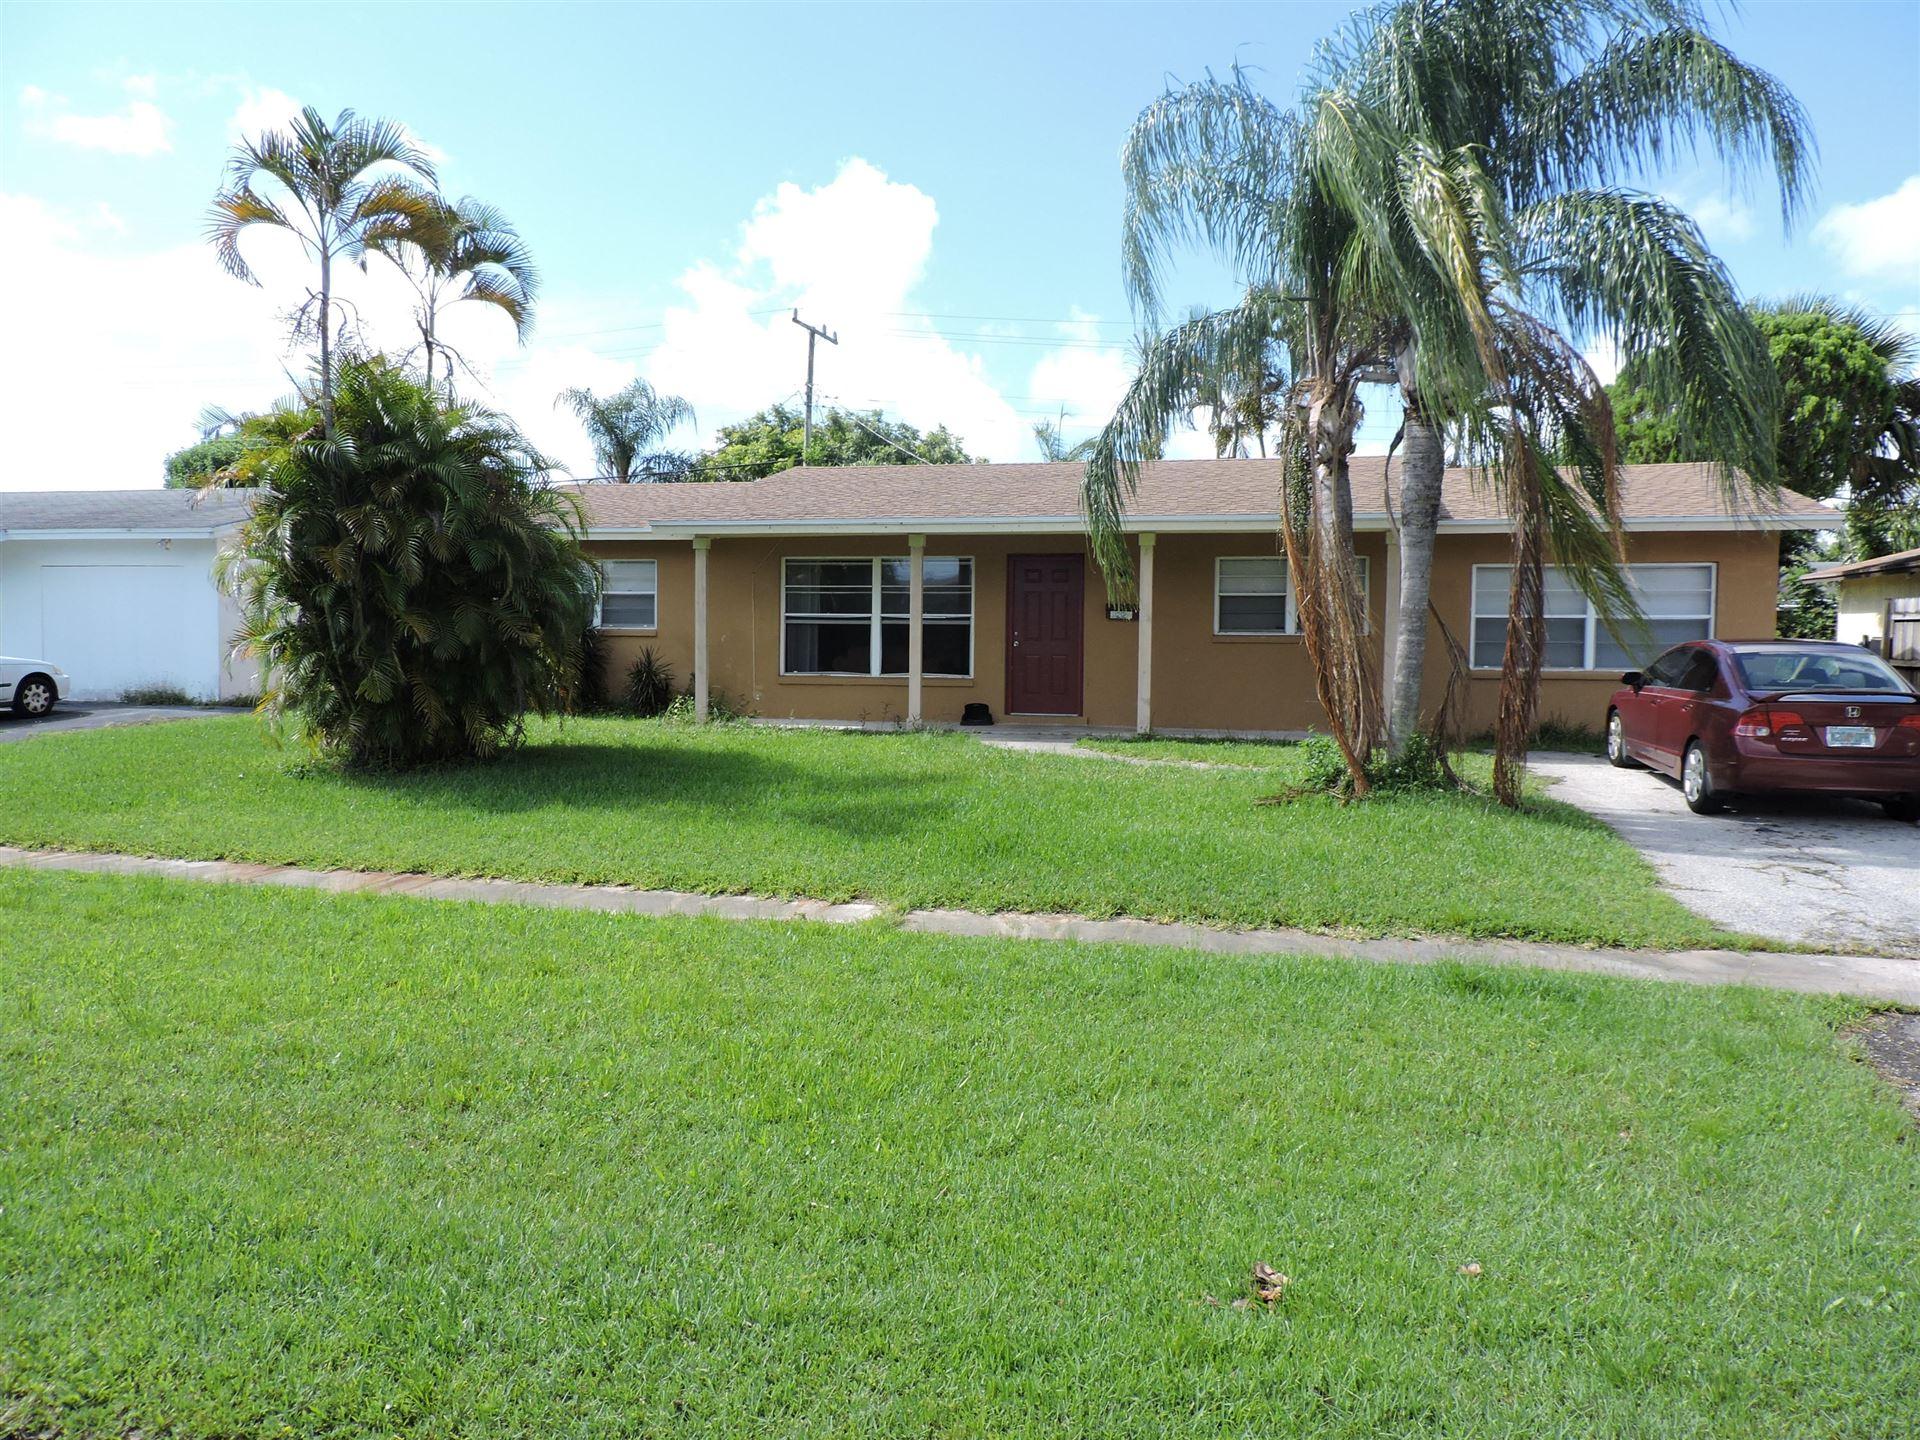 Photo of 3220 Bermuda Road, Palm Beach Gardens, FL 33410 (MLS # RX-10748054)